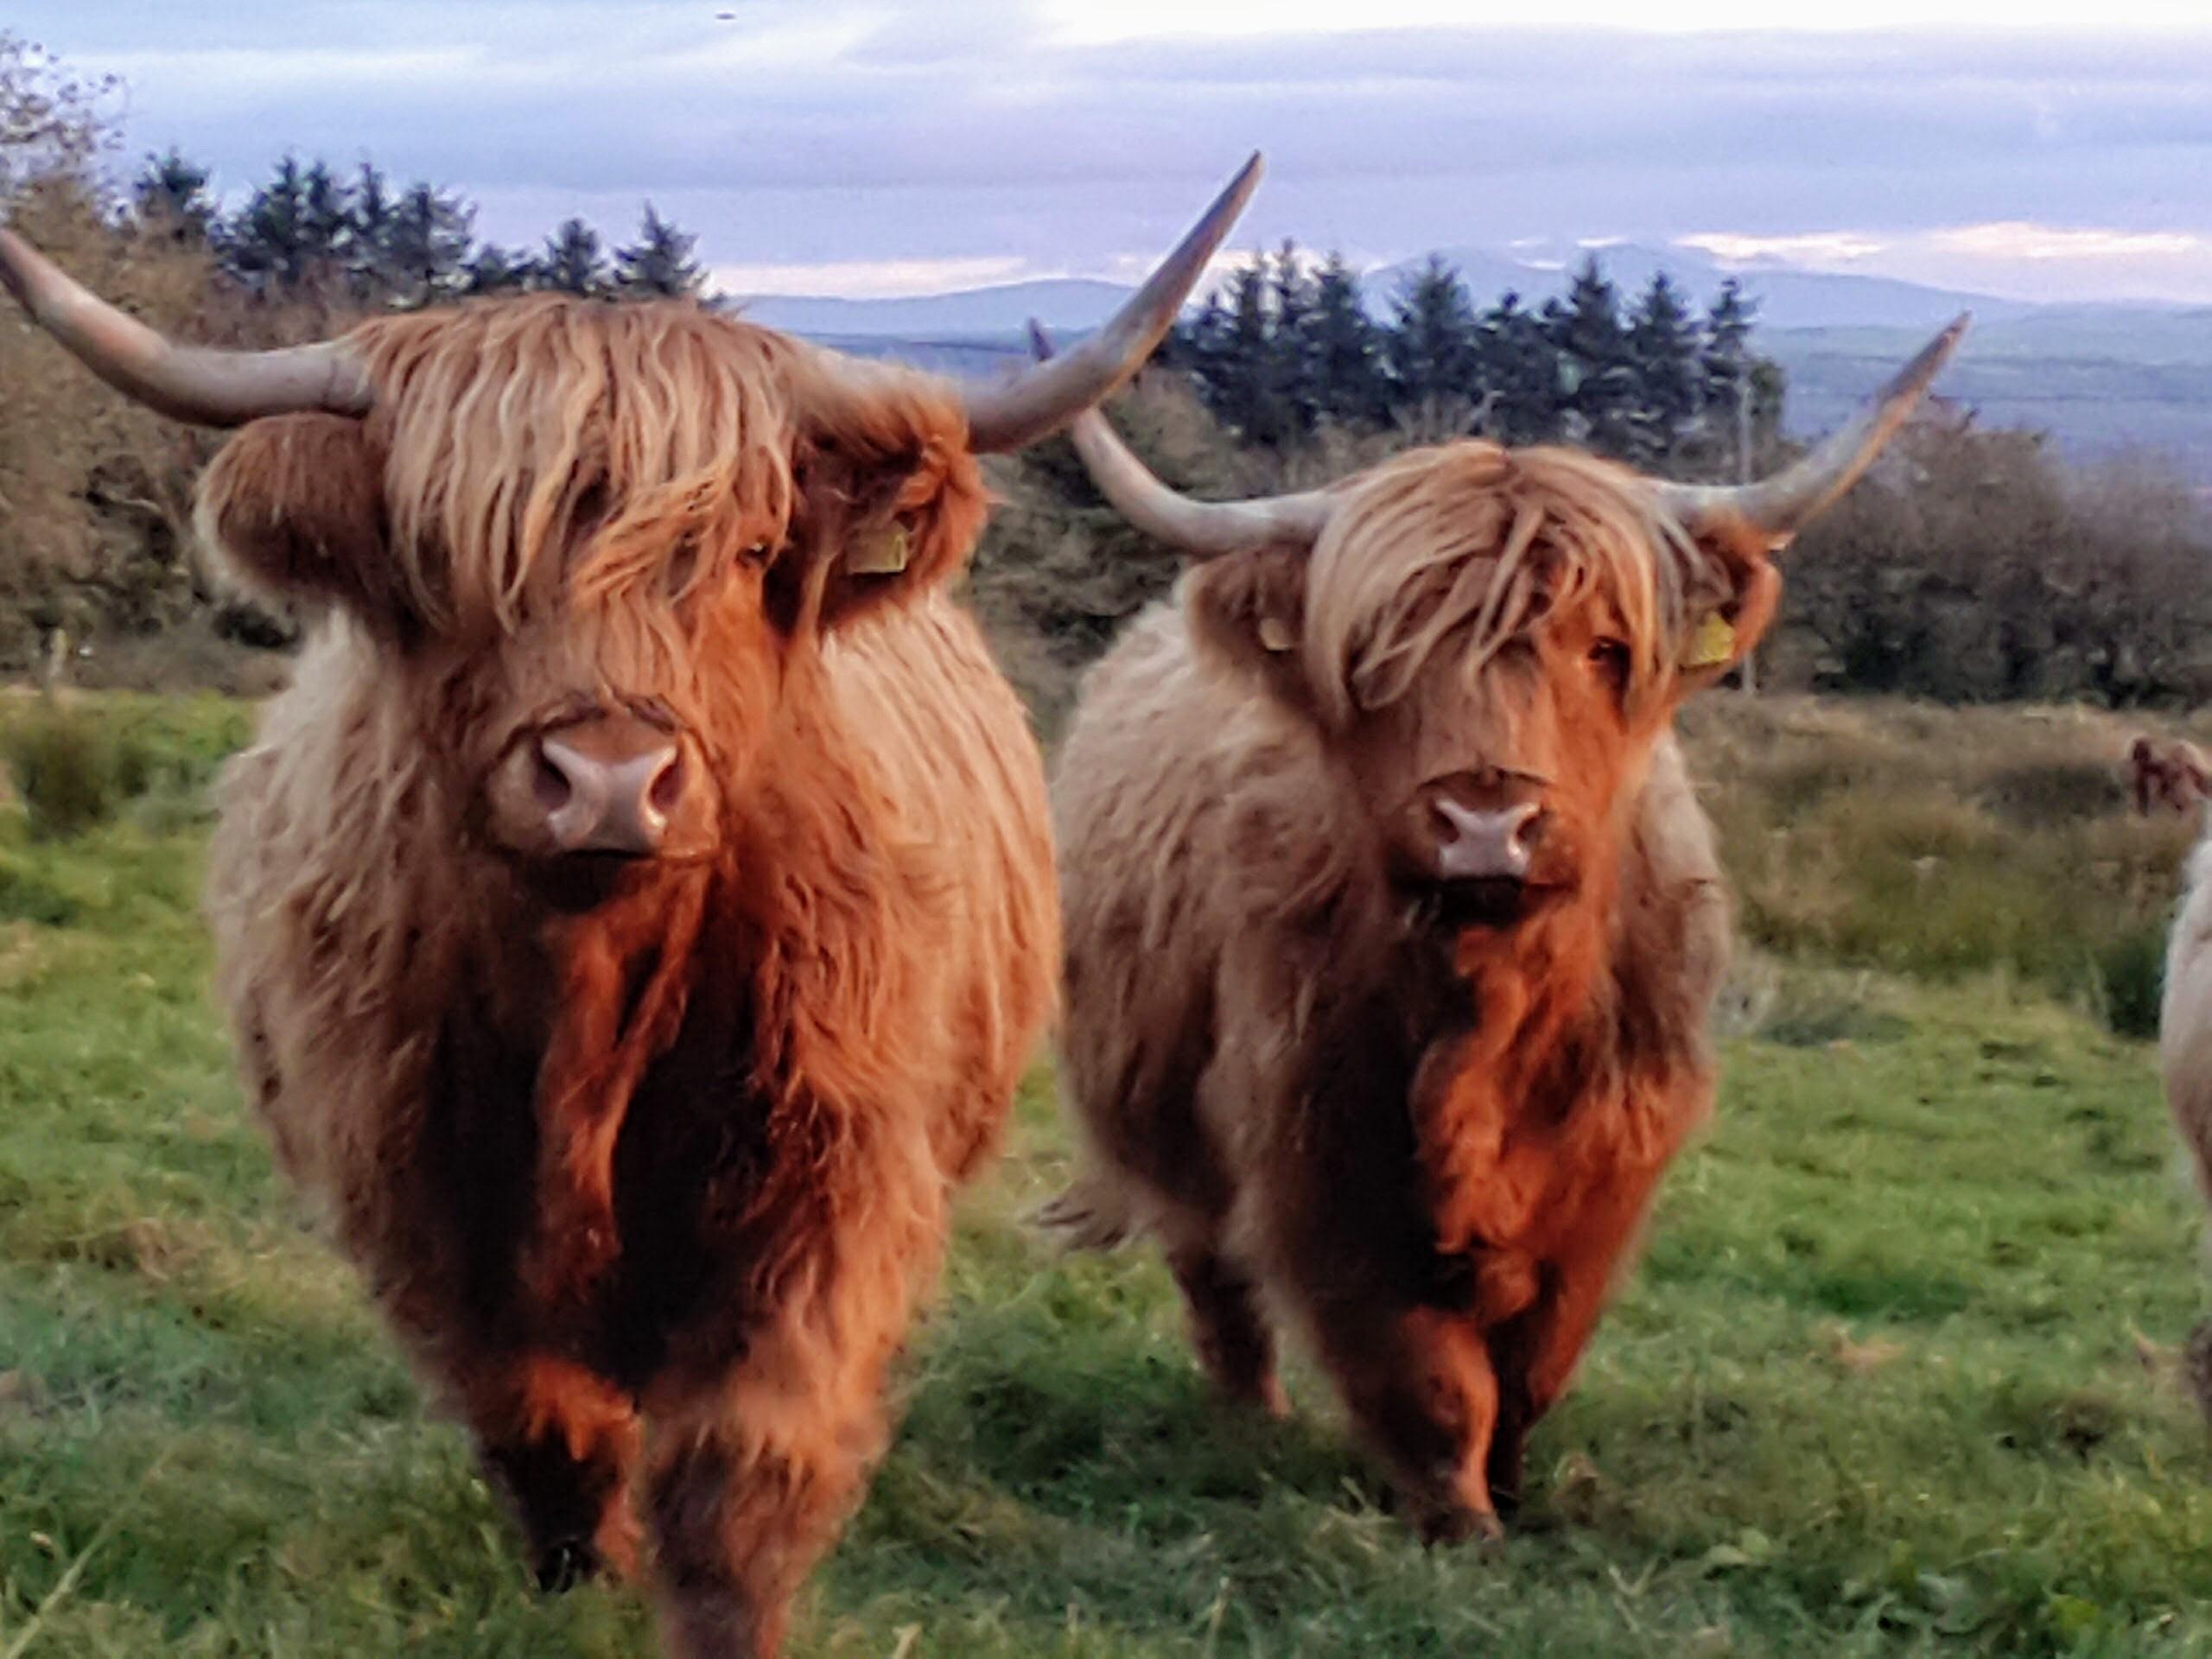 Highland cows at blackfieldfarm.com